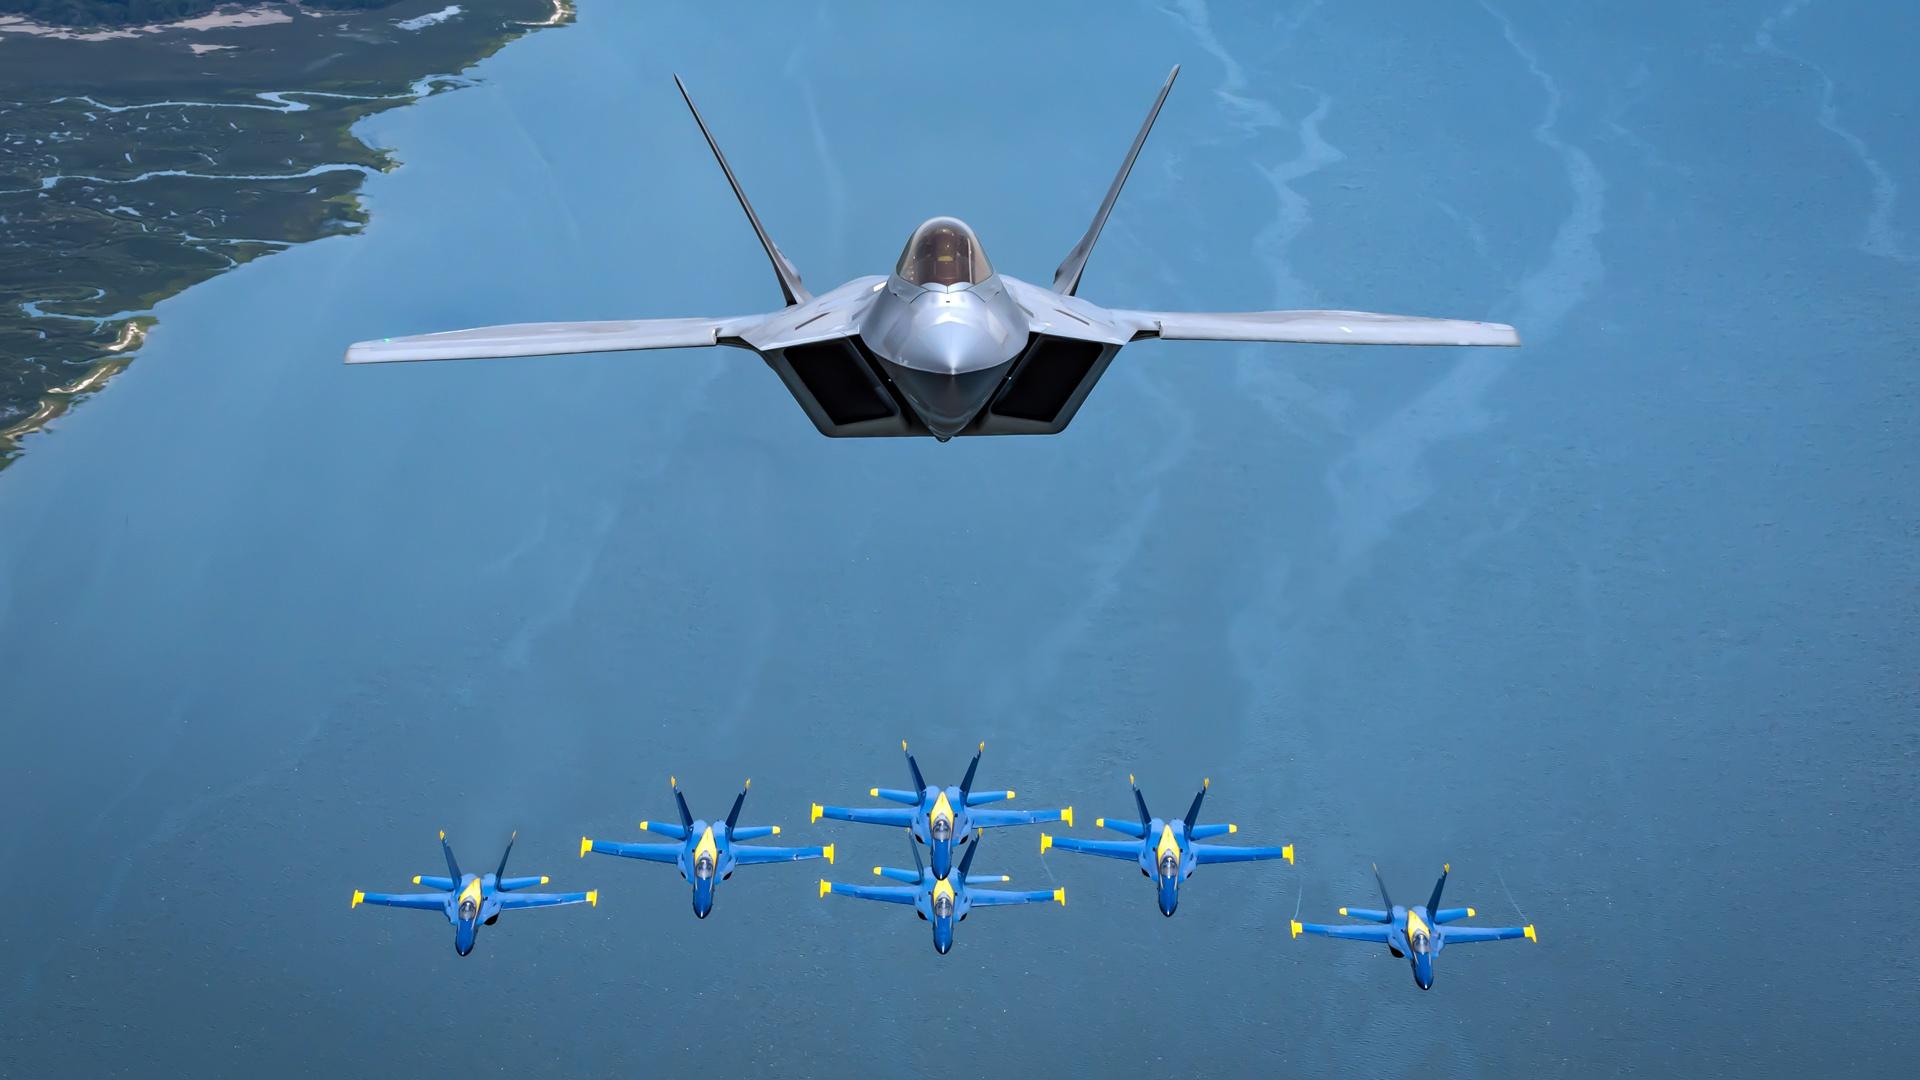 Lockheed Martin F 22 Raptor Hd Wallpaper Background Image